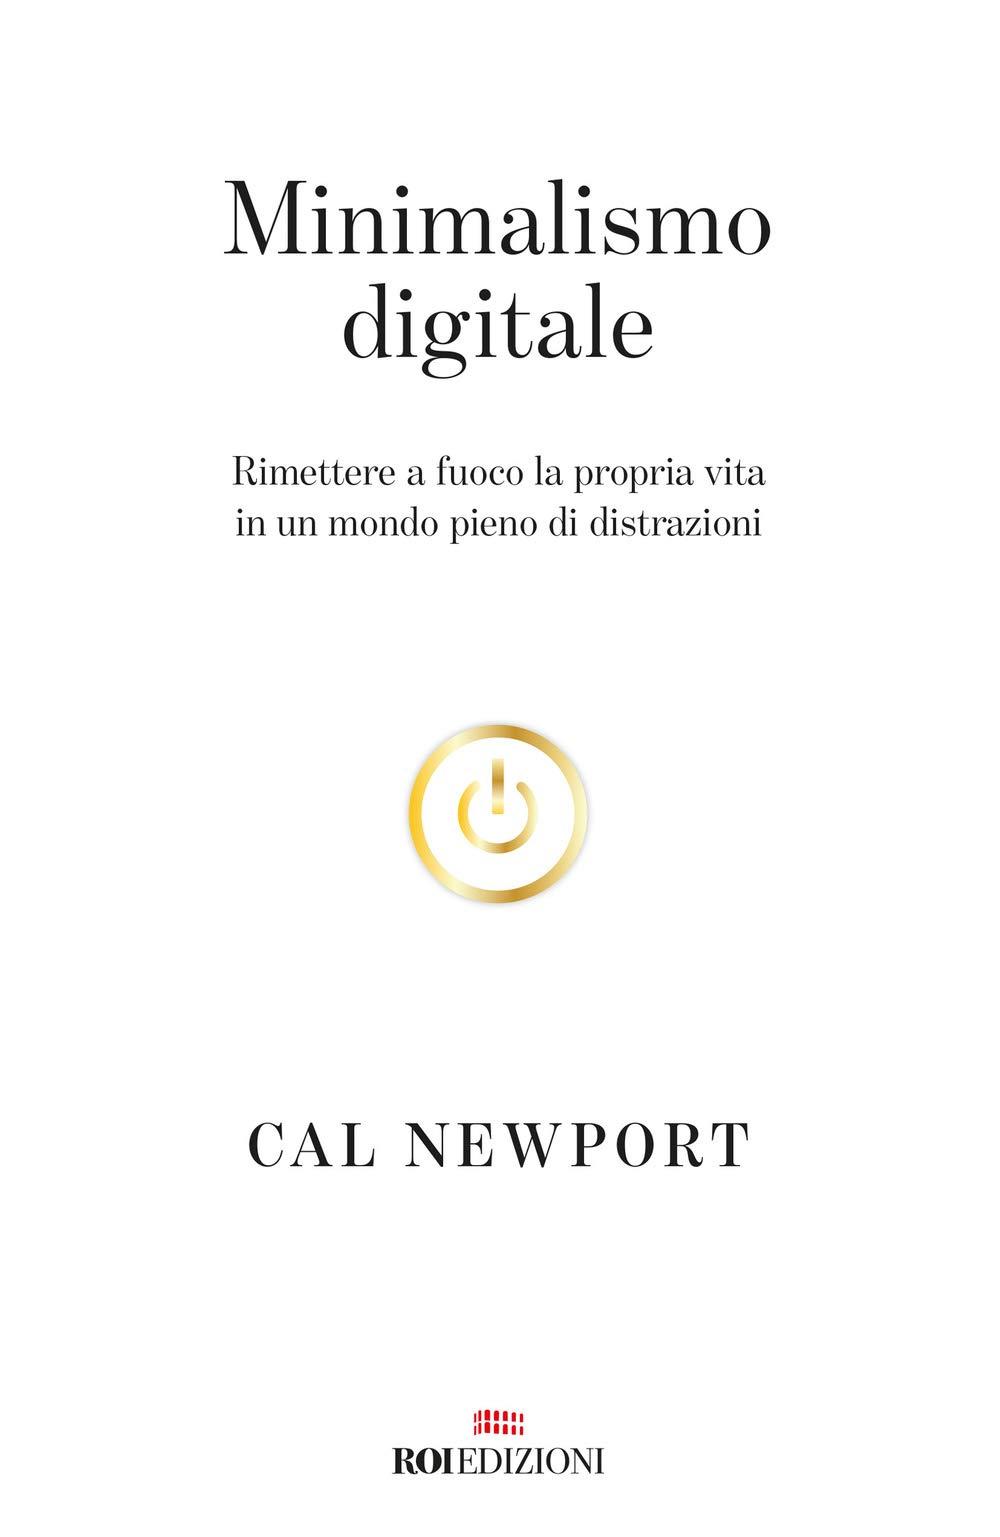 Minimalismo digitale - Cal Newport